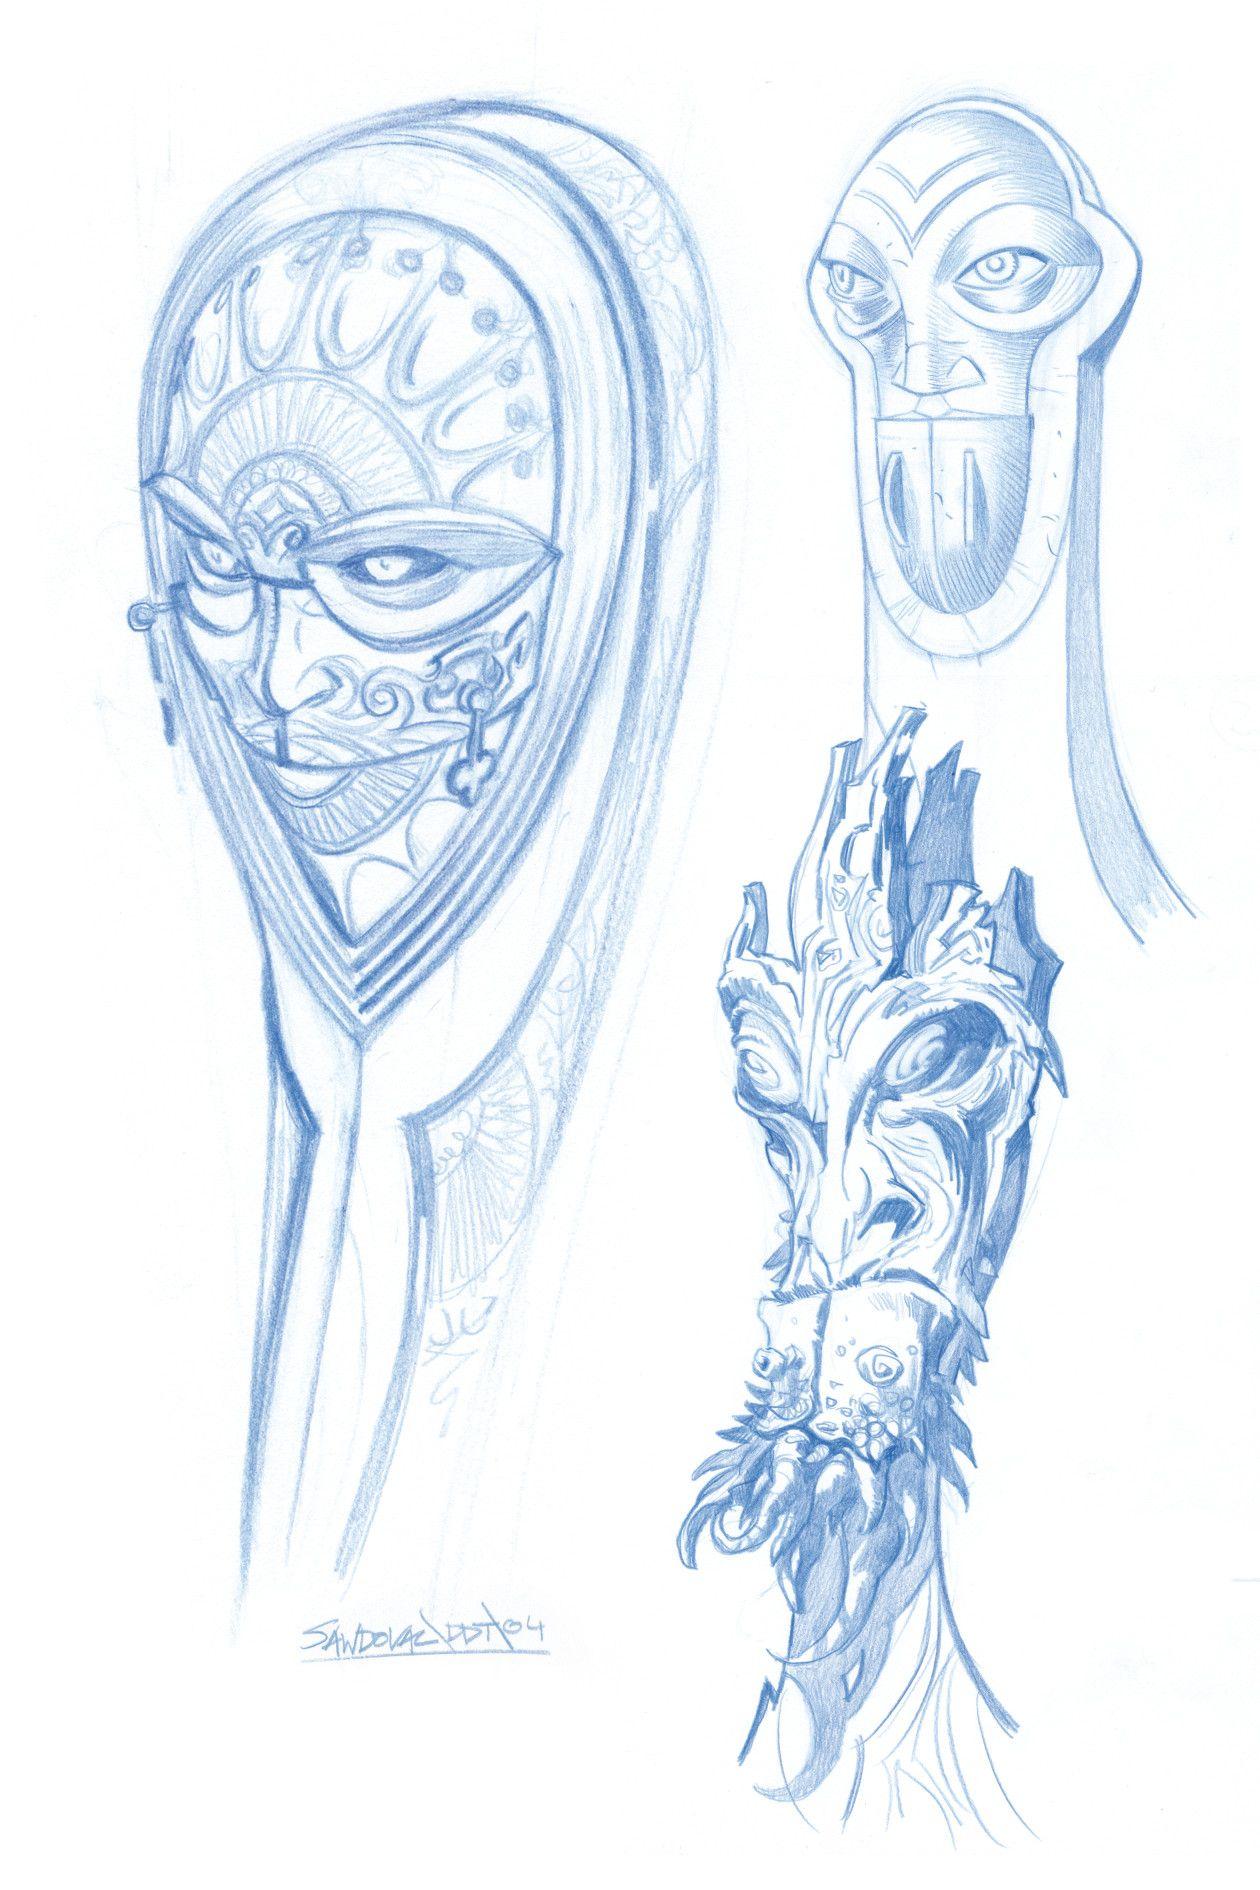 Artstation The Pale Man Character Design Pan 180 S